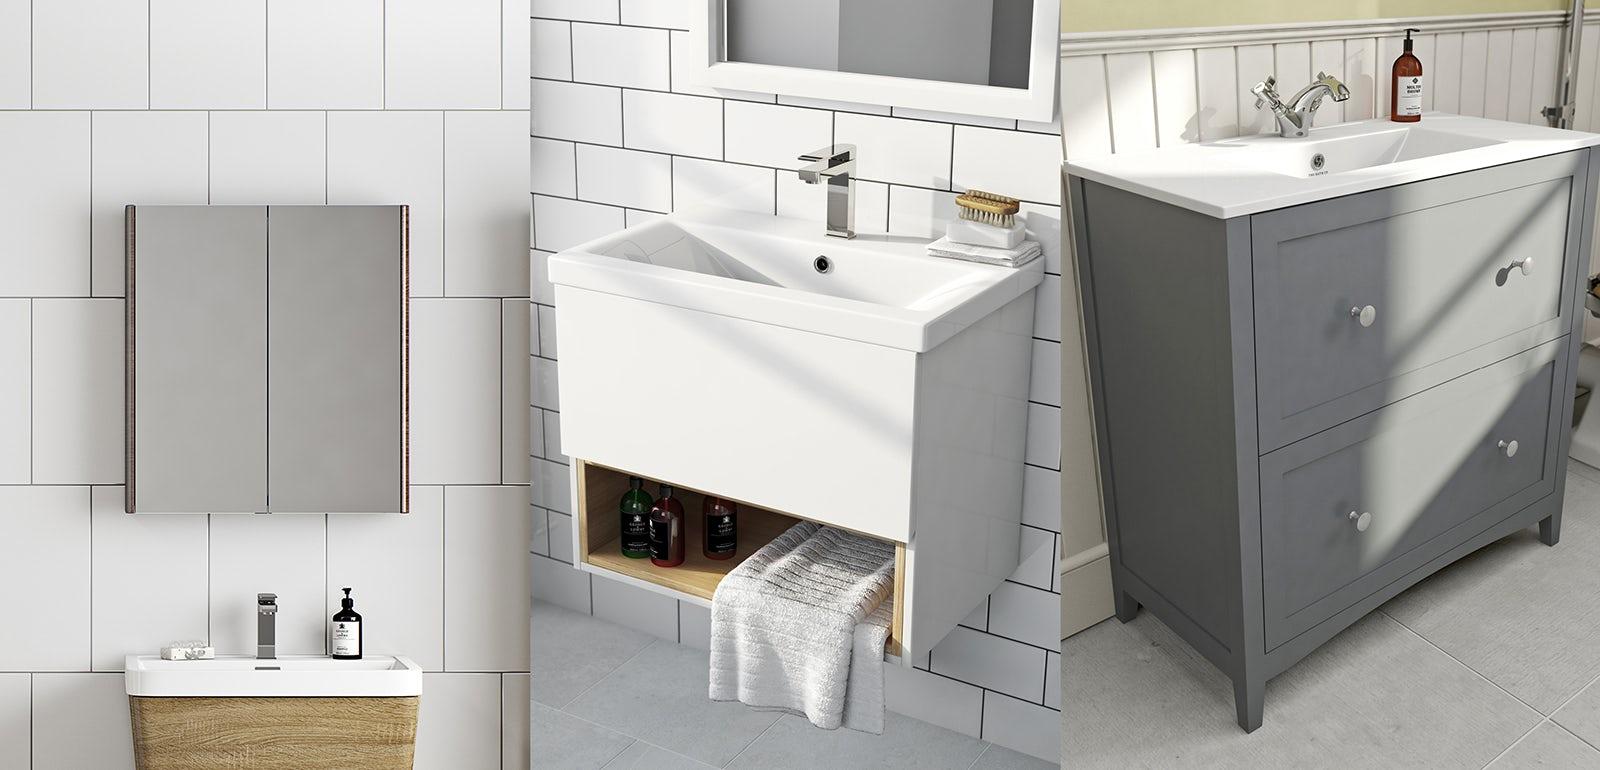 Calypso Bathroom Furniture. Great Marietta Semi Recessed Basin With ...